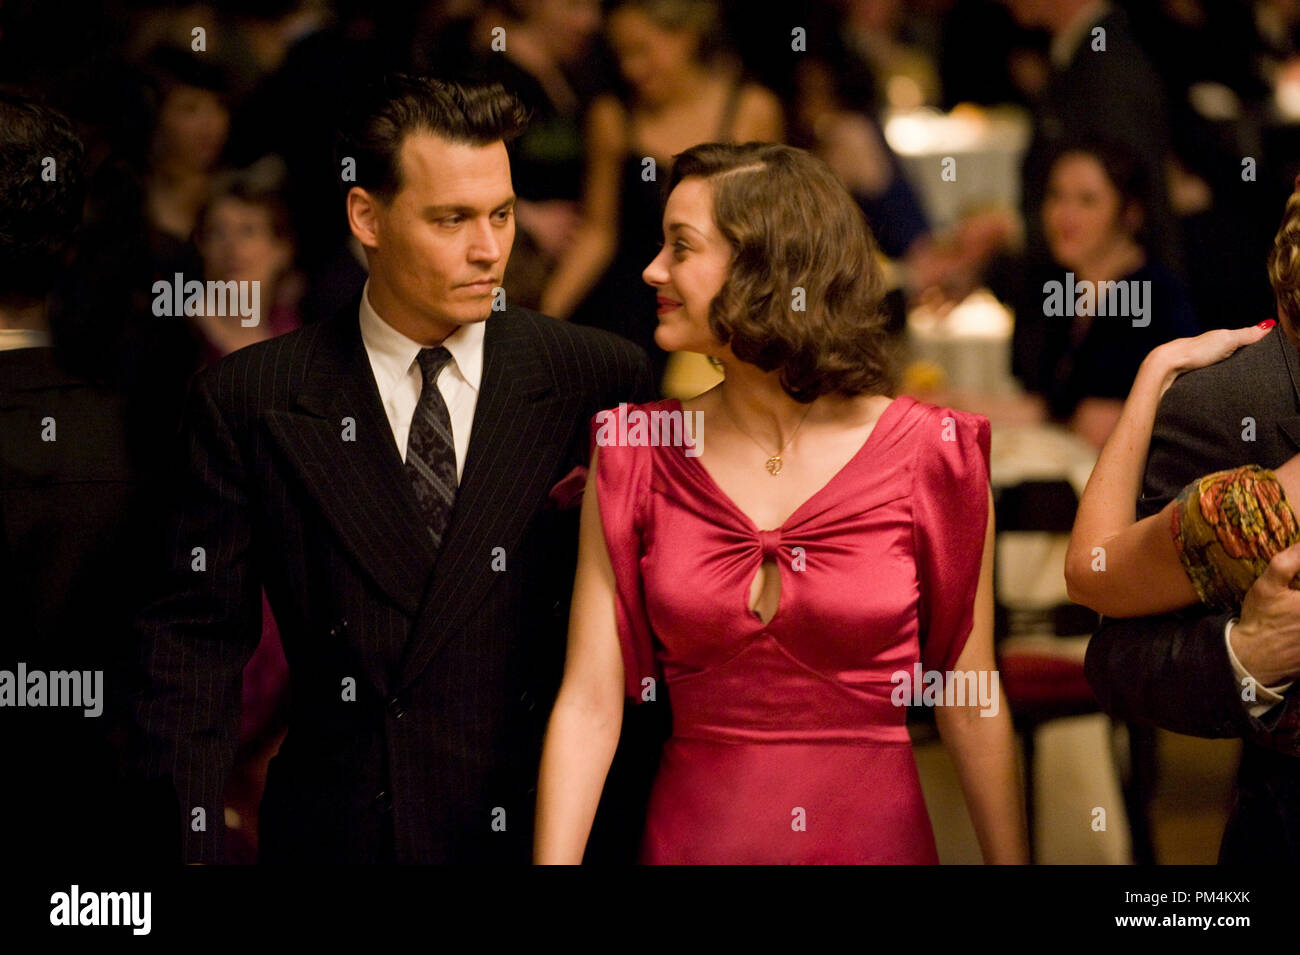 'Public Enemies' Johnny Depp and Marion Cotillard - Stock Image